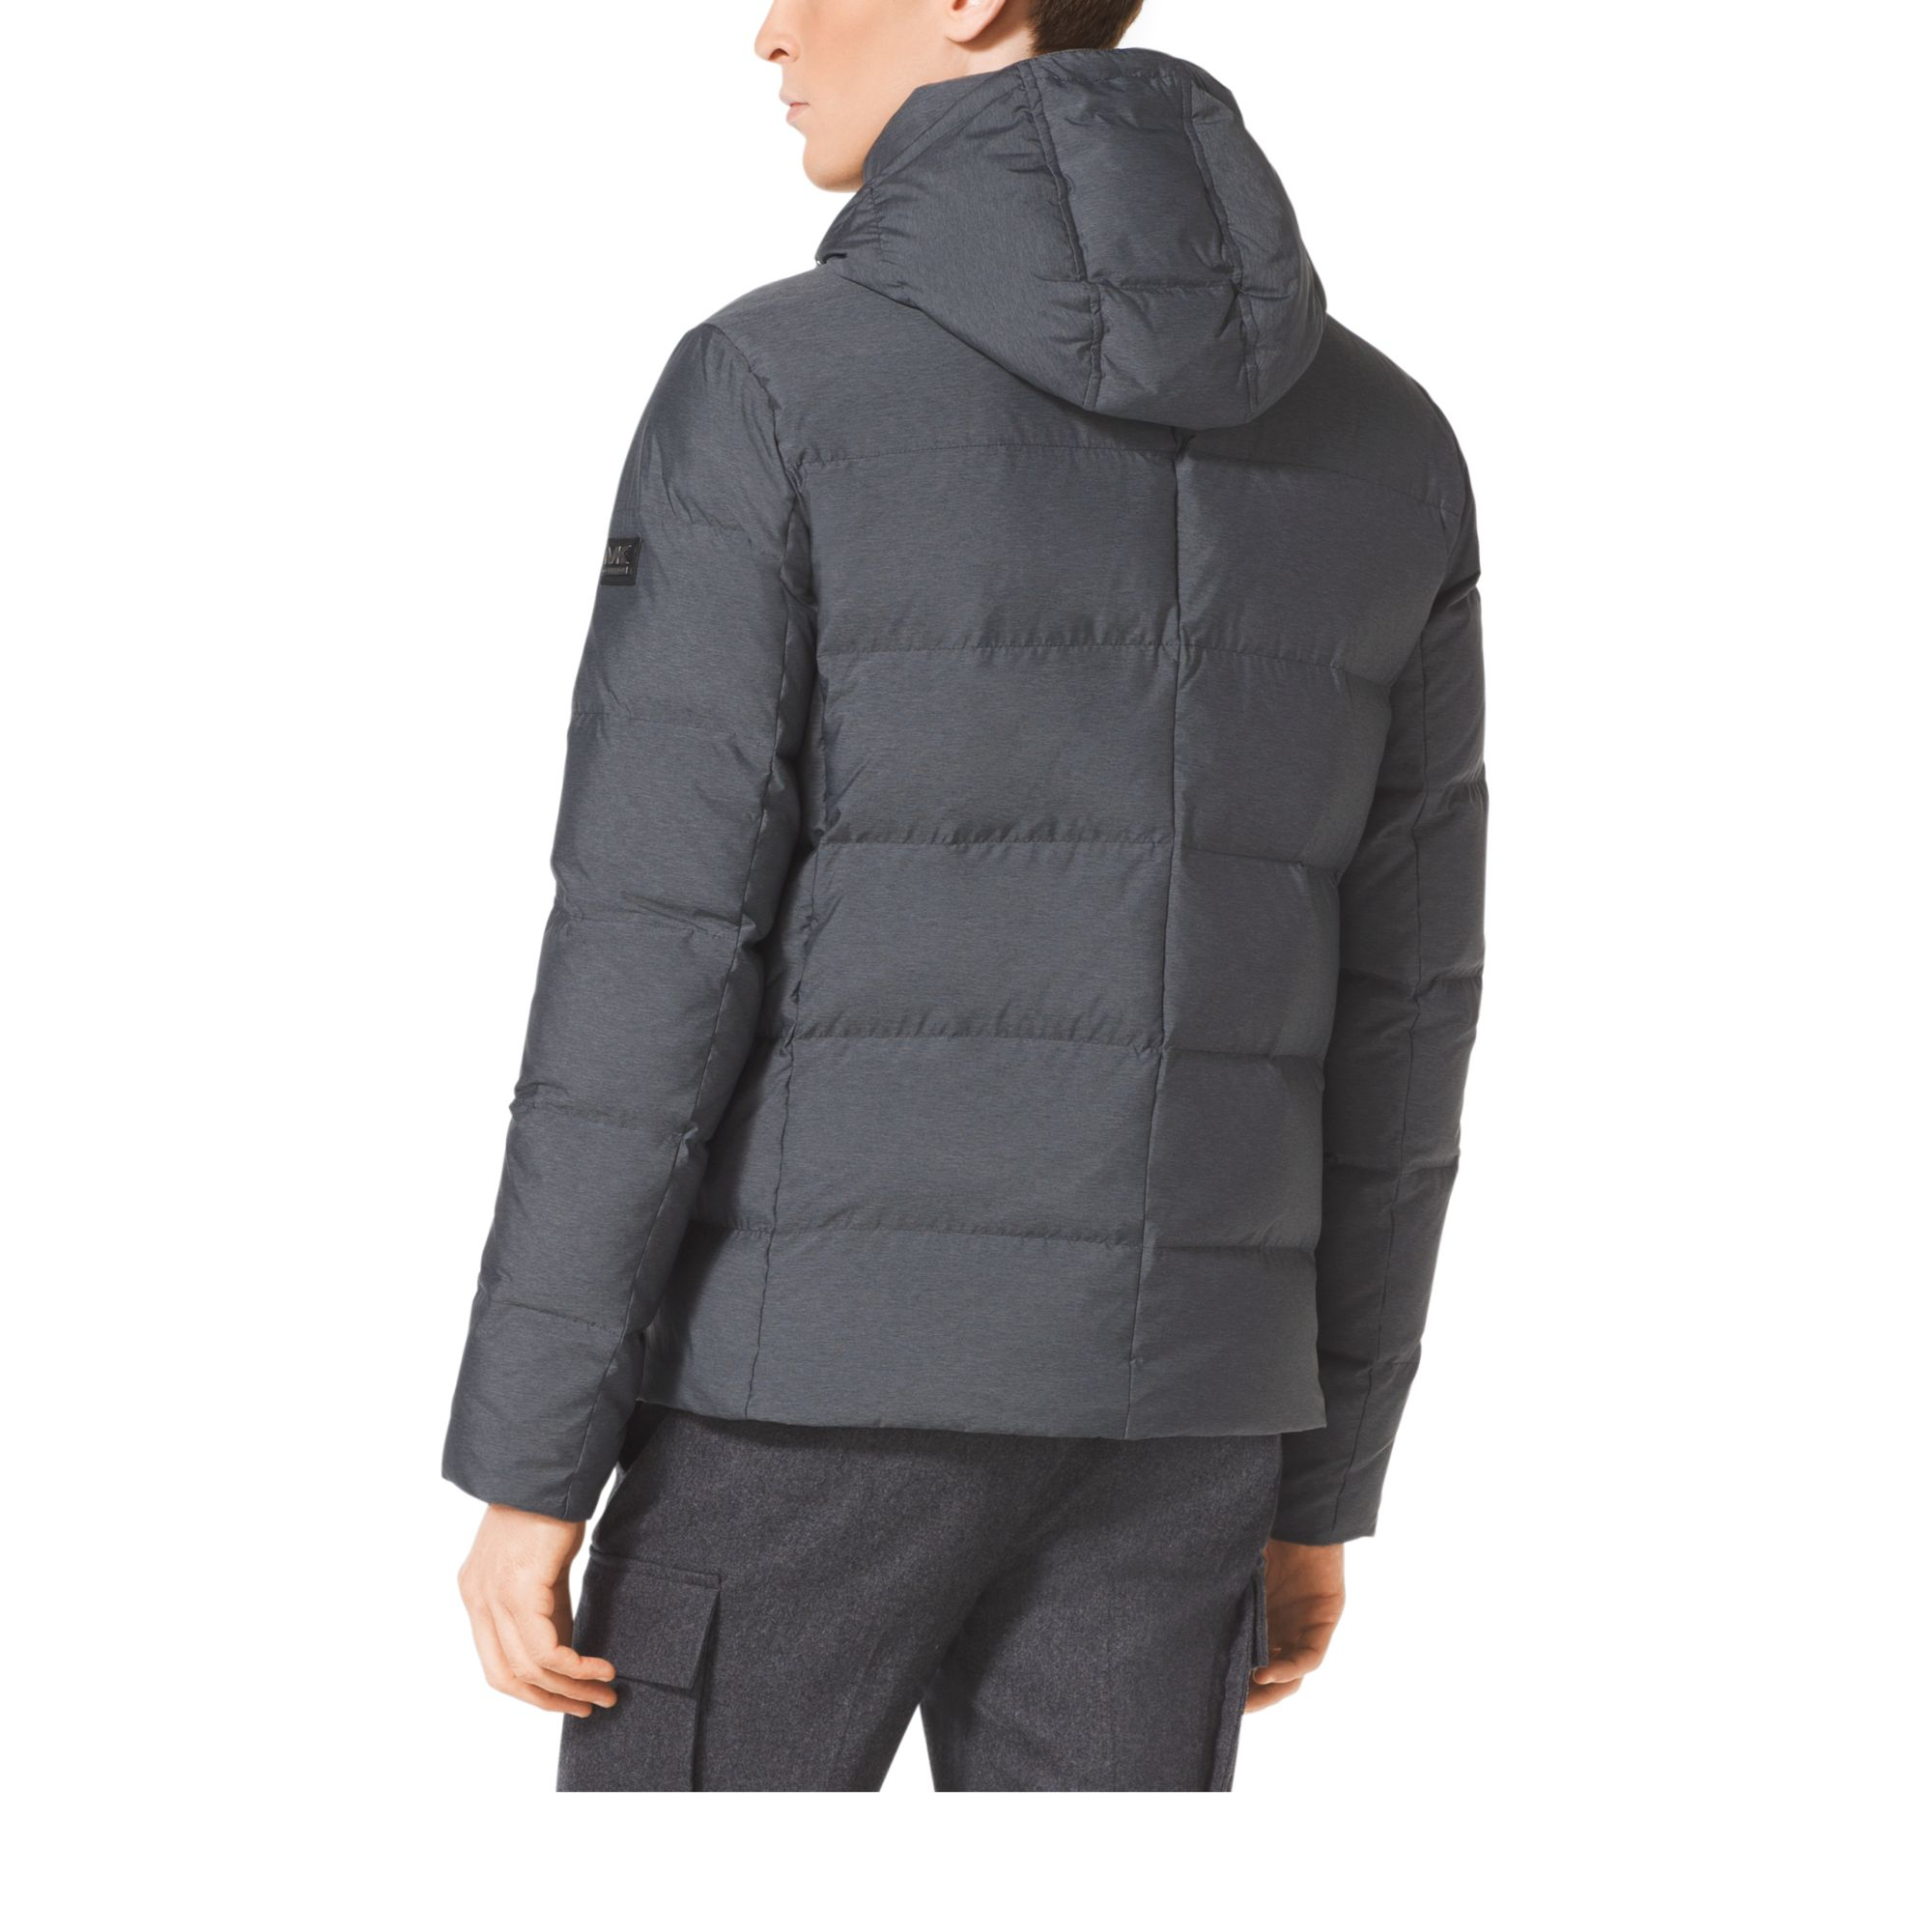 michael kors nylon down jacket in gray for men lyst. Black Bedroom Furniture Sets. Home Design Ideas